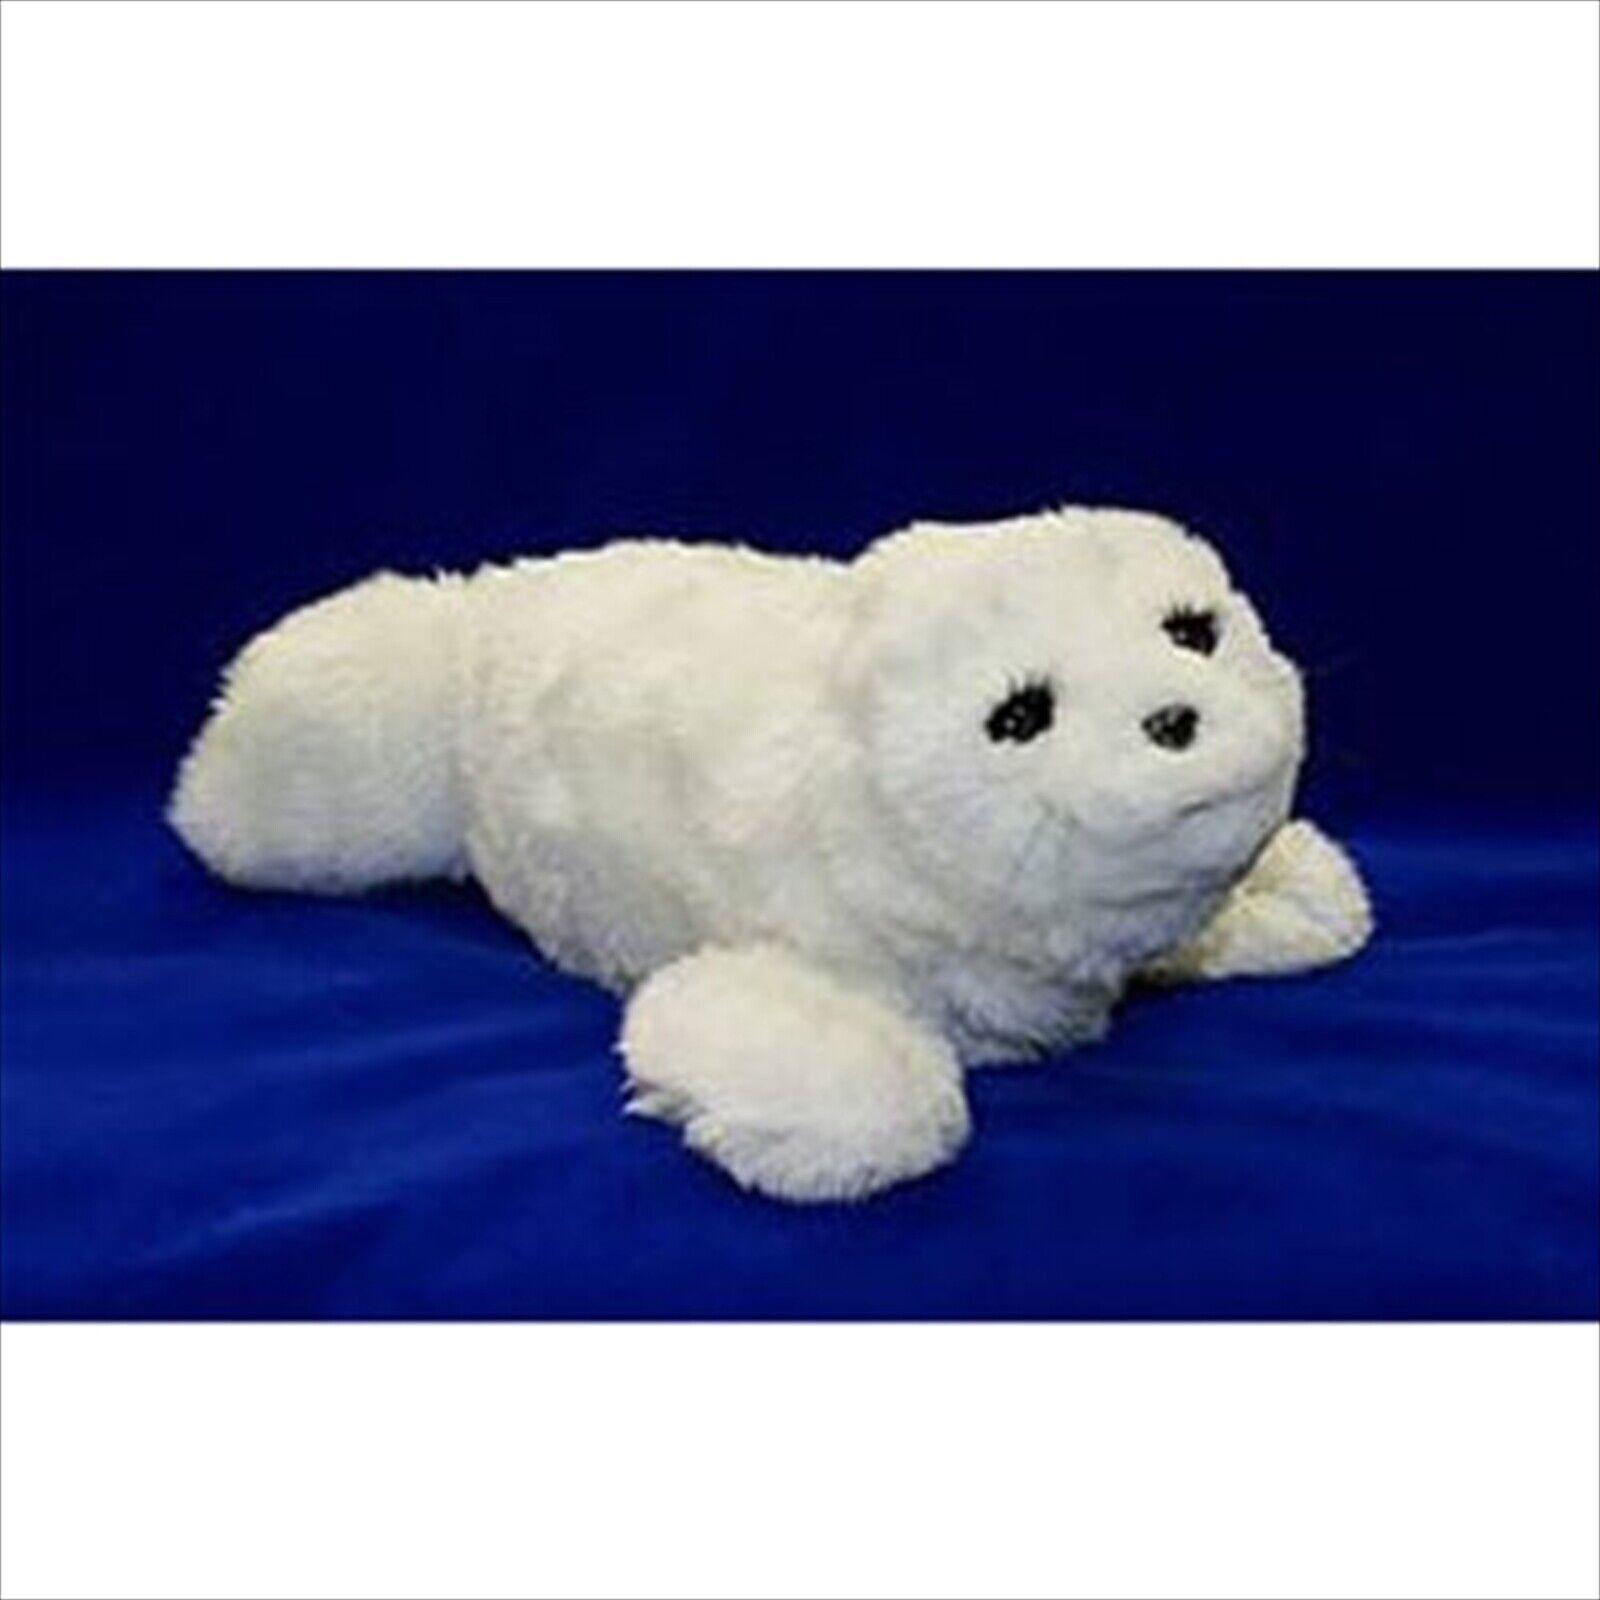 Maruei-Mental-Seal-Type-Robot-Paro-Animal-Therapy-bianca    from-Japan nuovo  basso prezzo del 40%